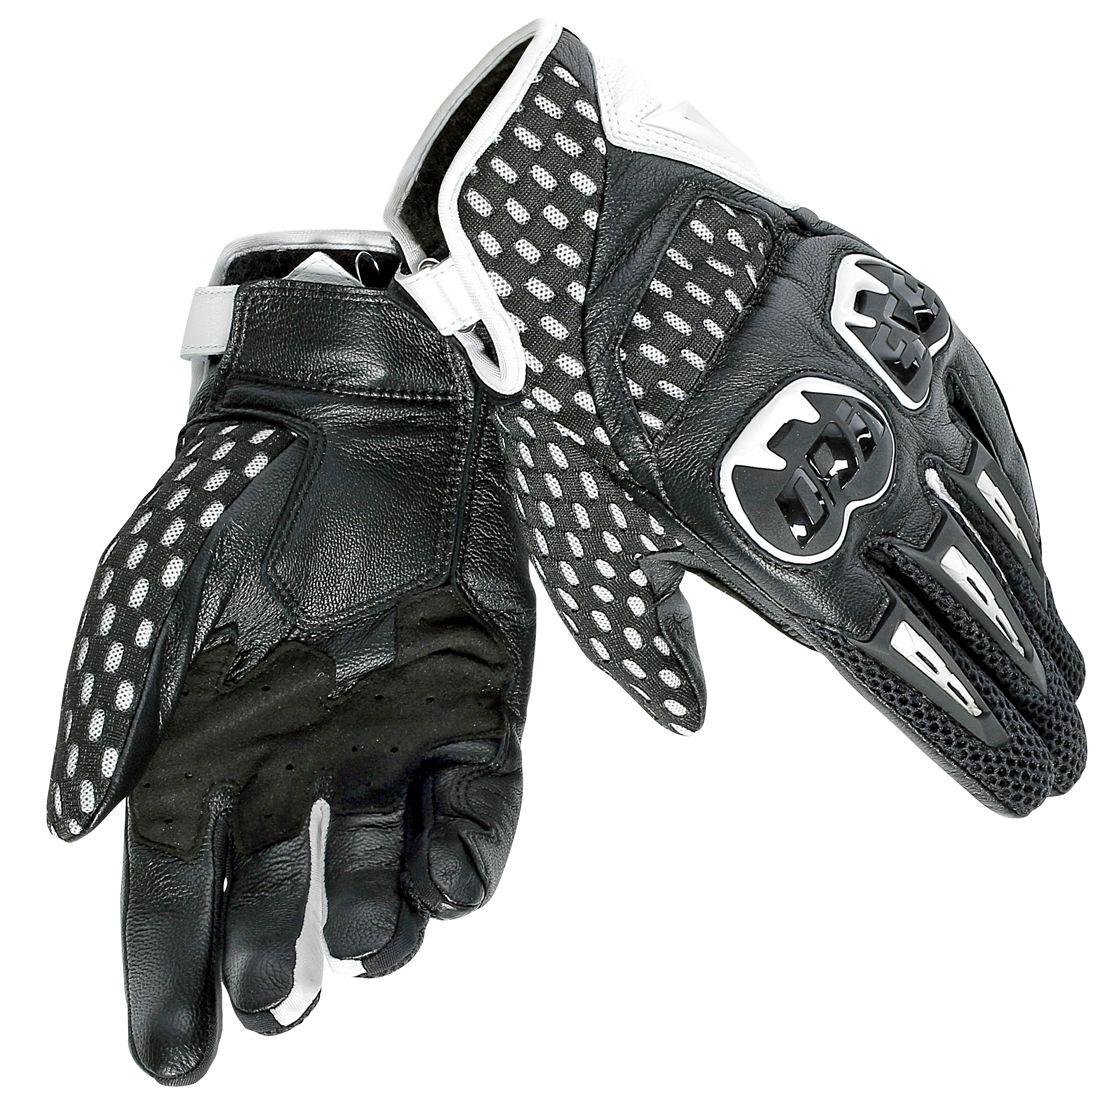 【DAINESE】AIR HERO 紡織手套 - 「Webike-摩托百貨」